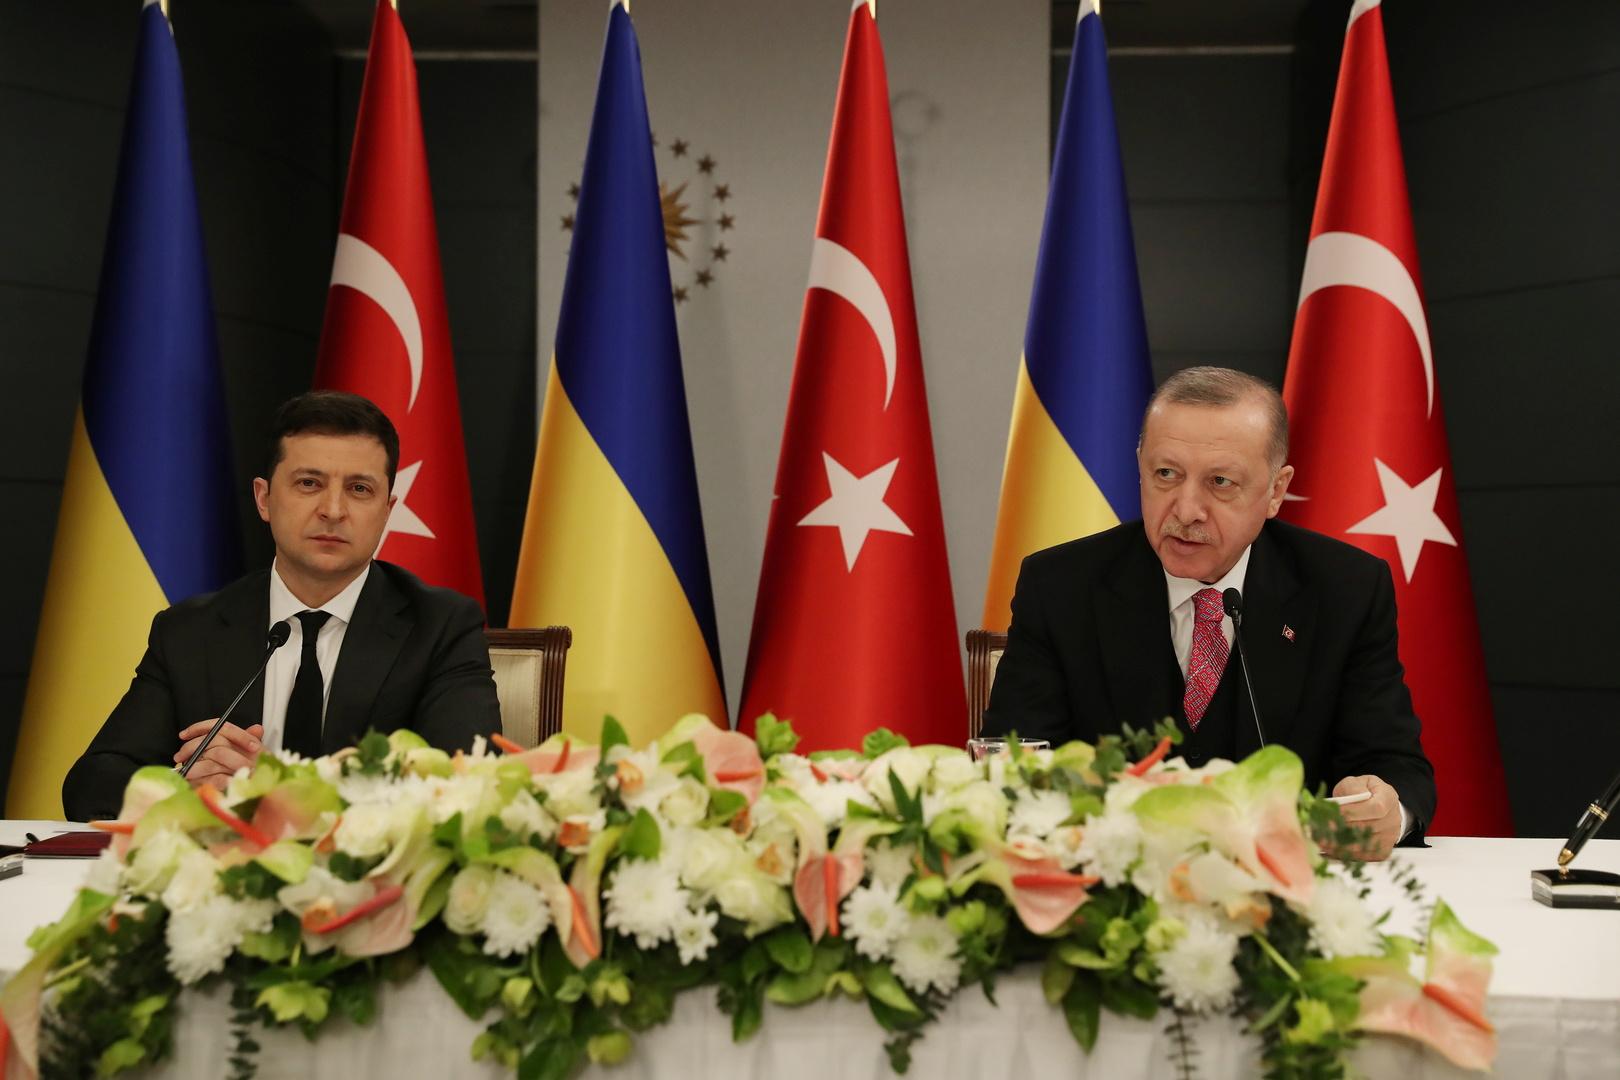 بيان أوكراني تركي مشترك يدعم آفاق انضمام كييف للناتو